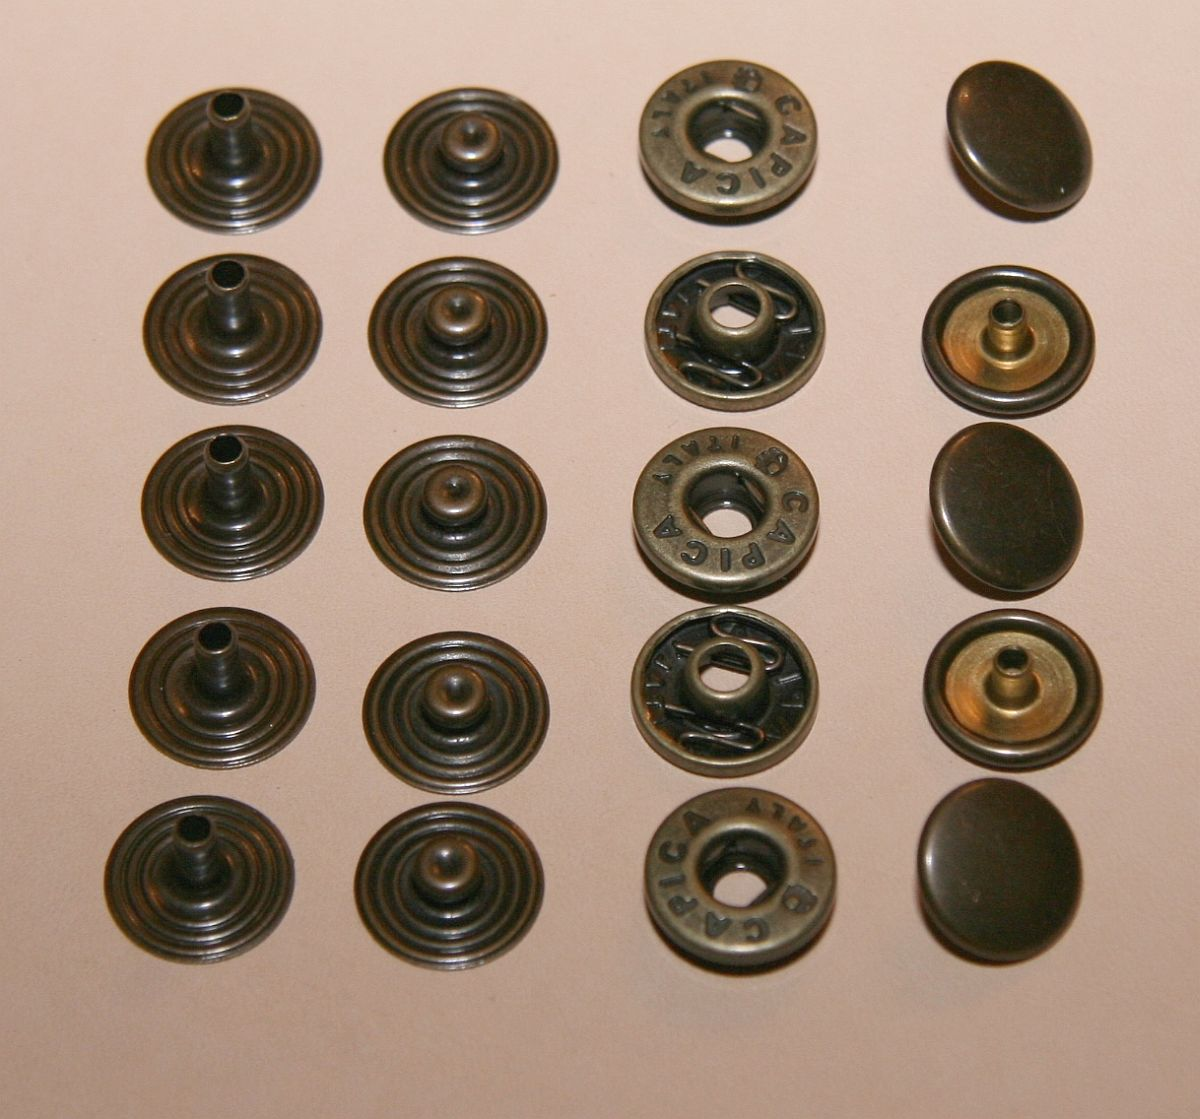 acheter bouton pression